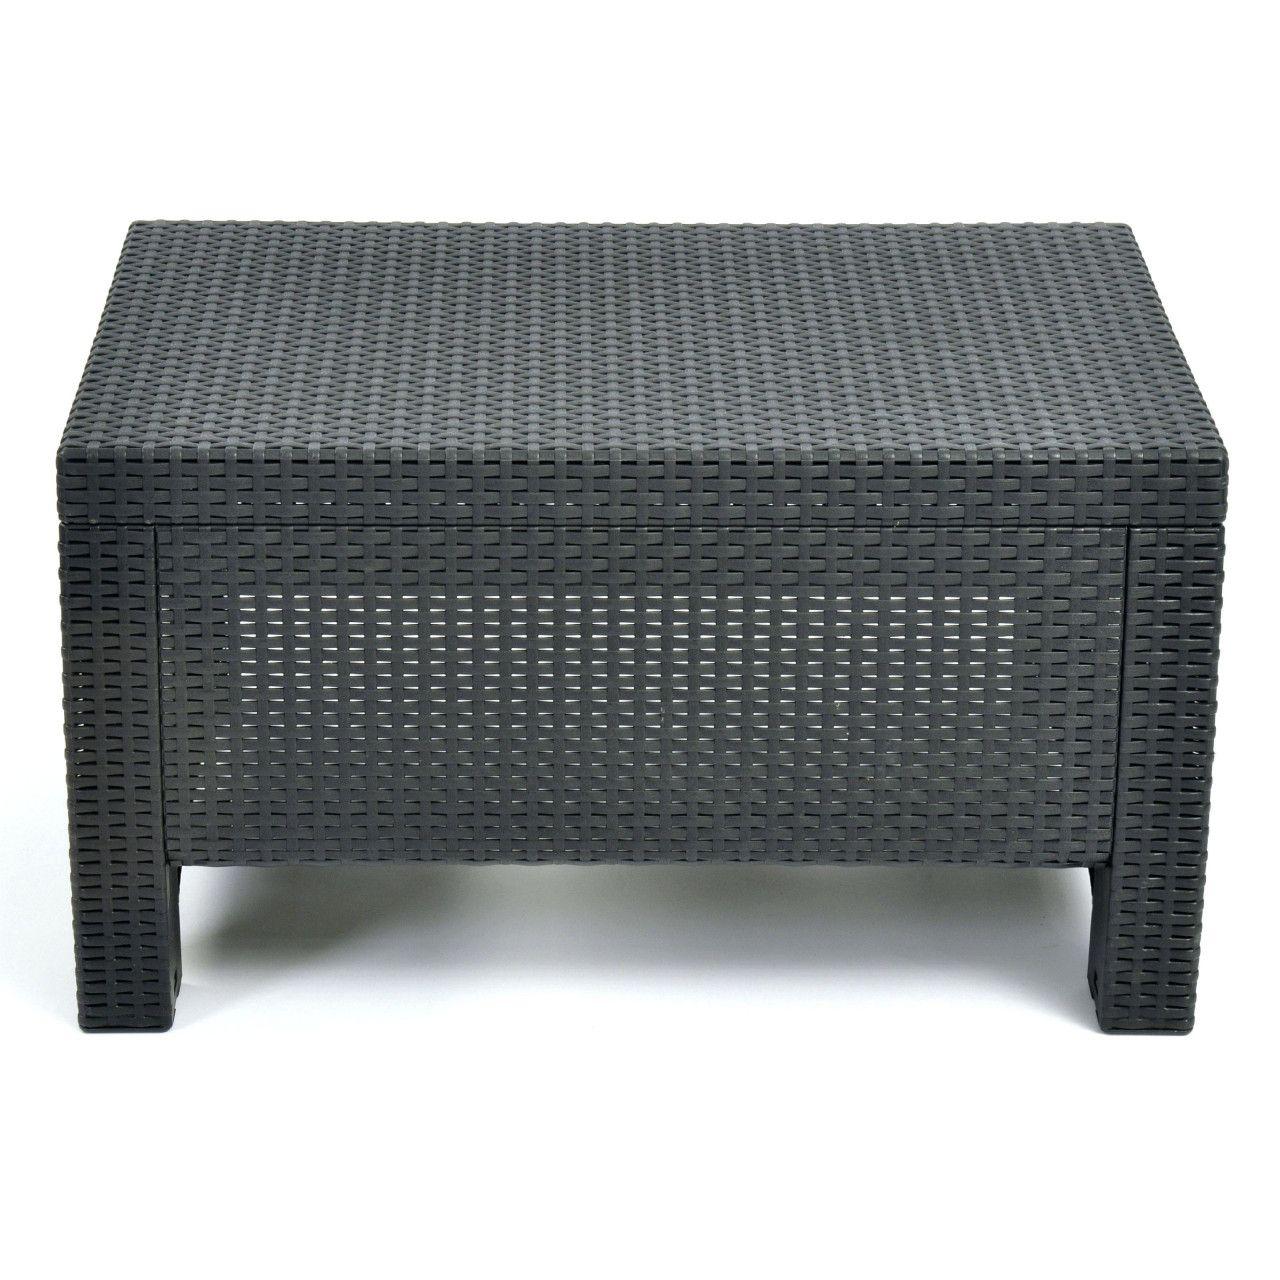 201 beautiful gray ottoman coffee table 2019 plastic